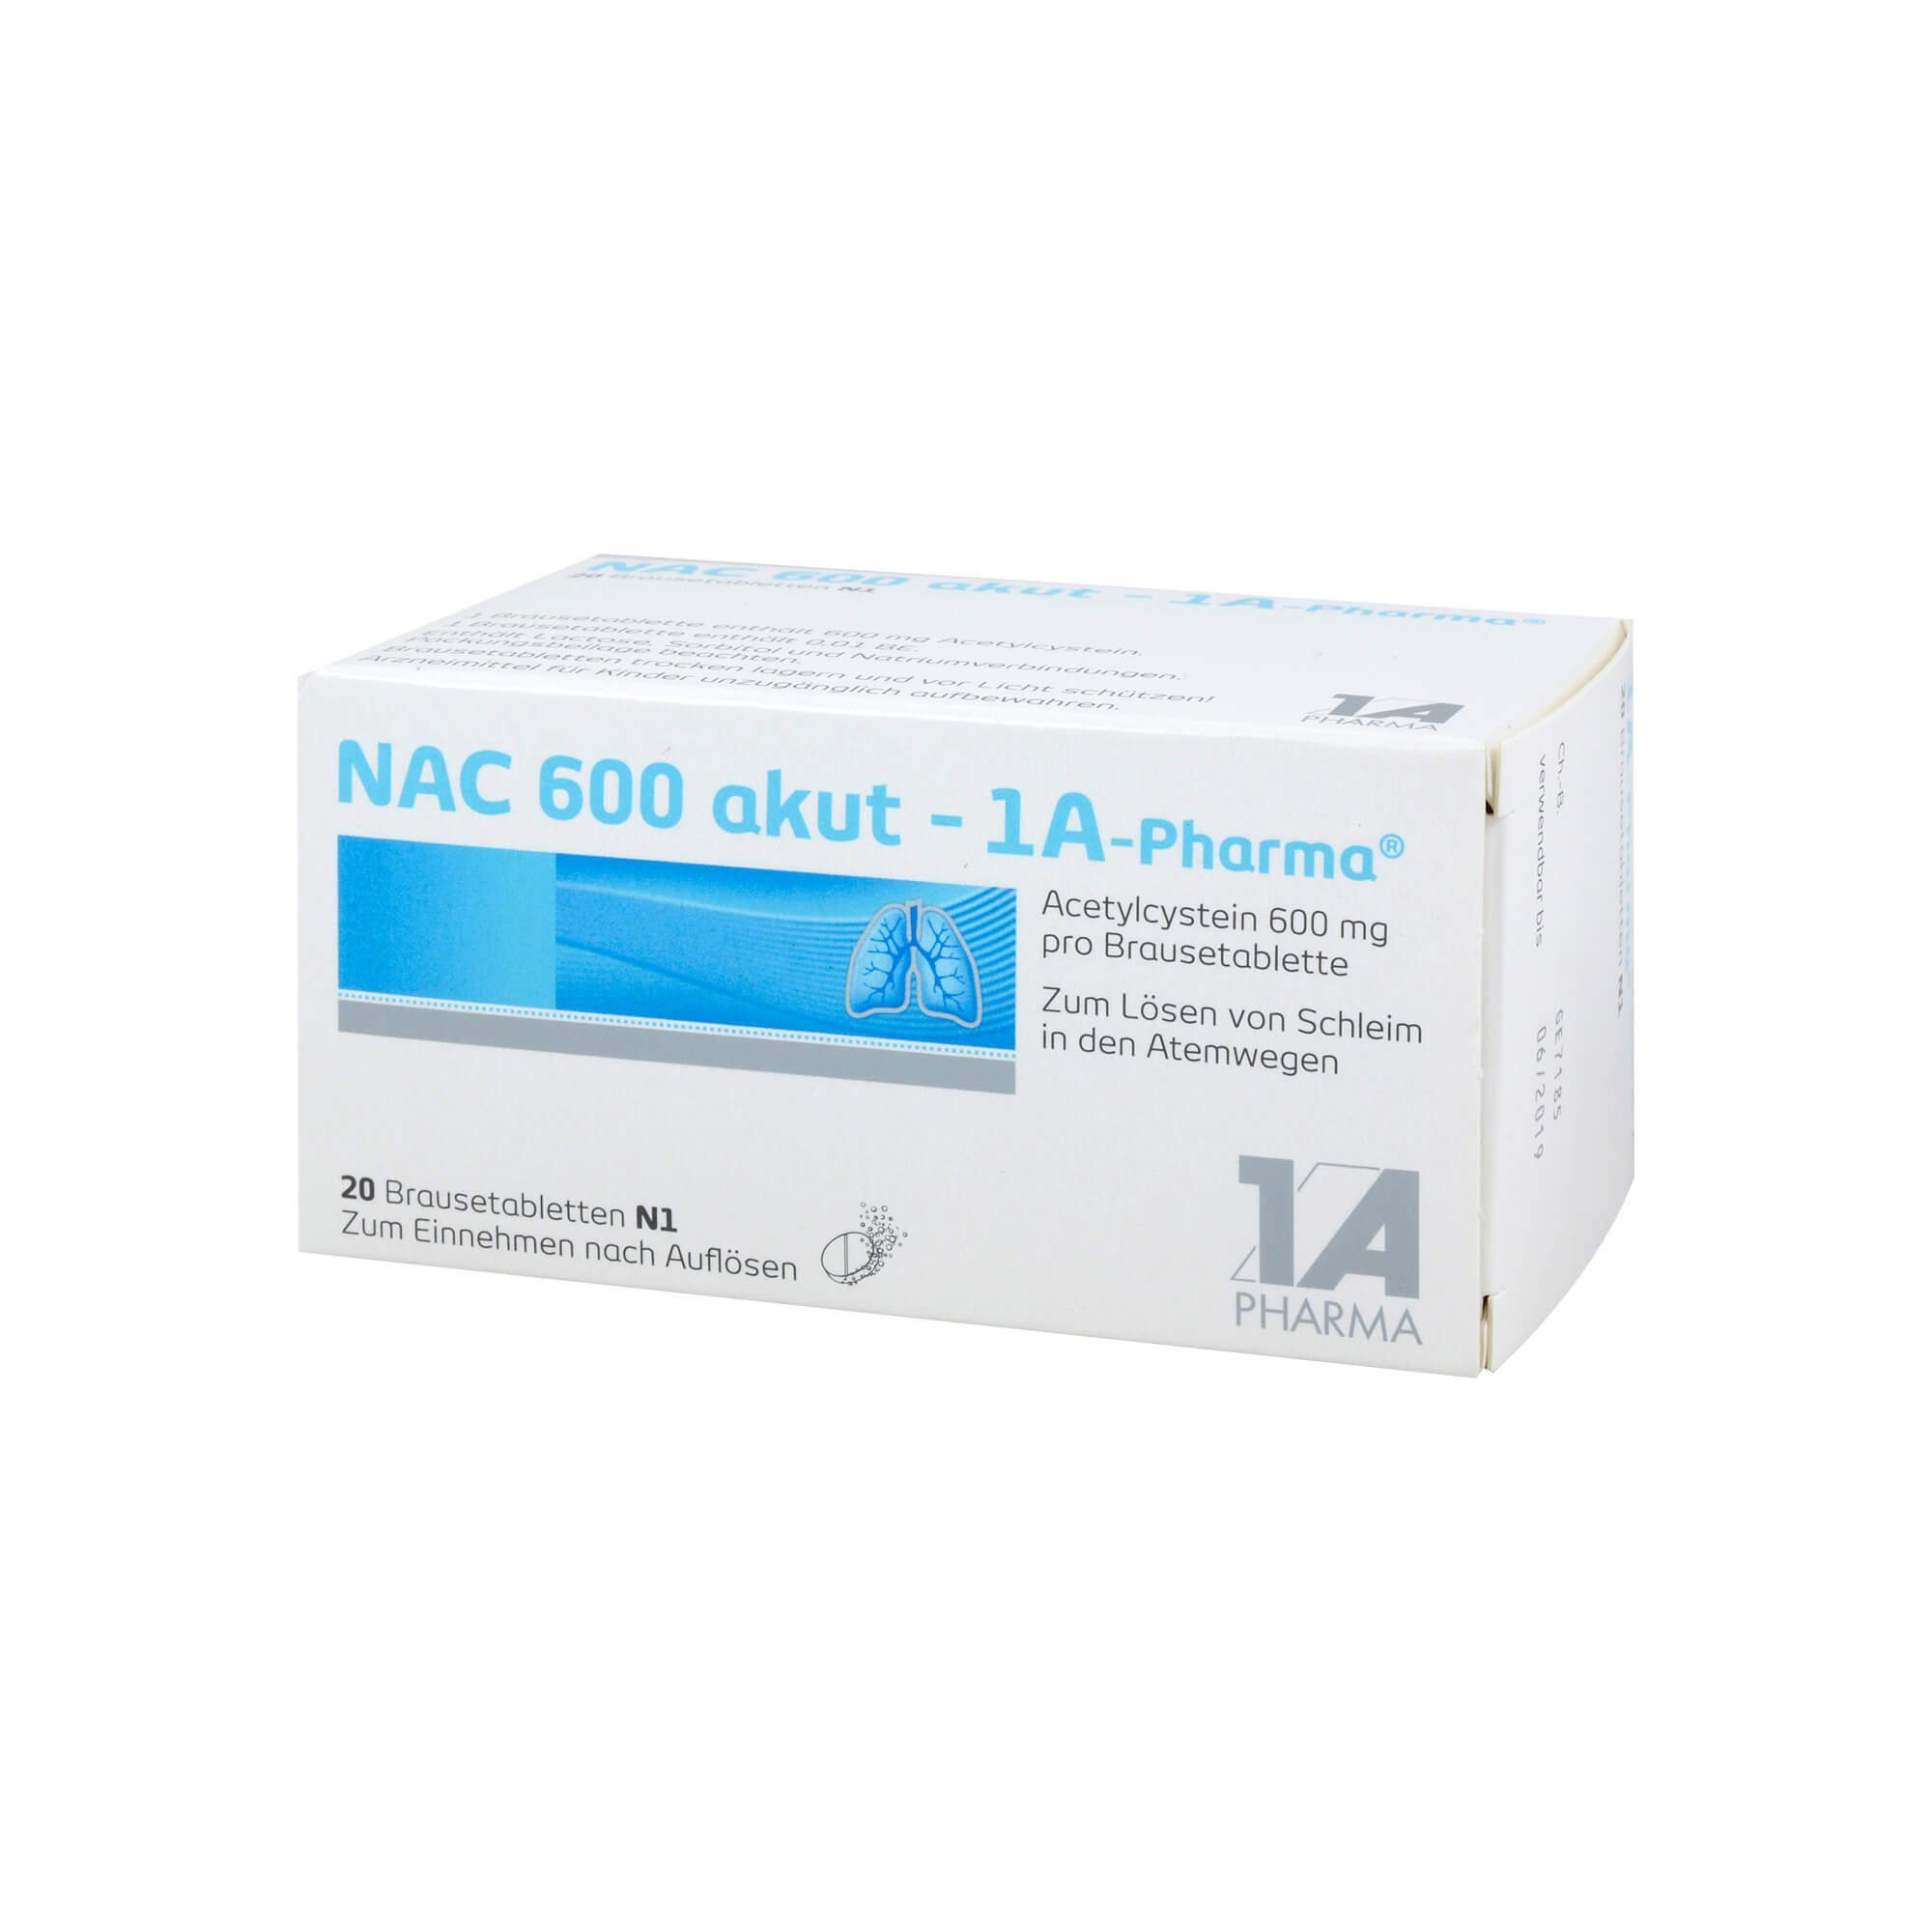 Nac 600 akut 1A Pharma Brausetabletten, 20 St